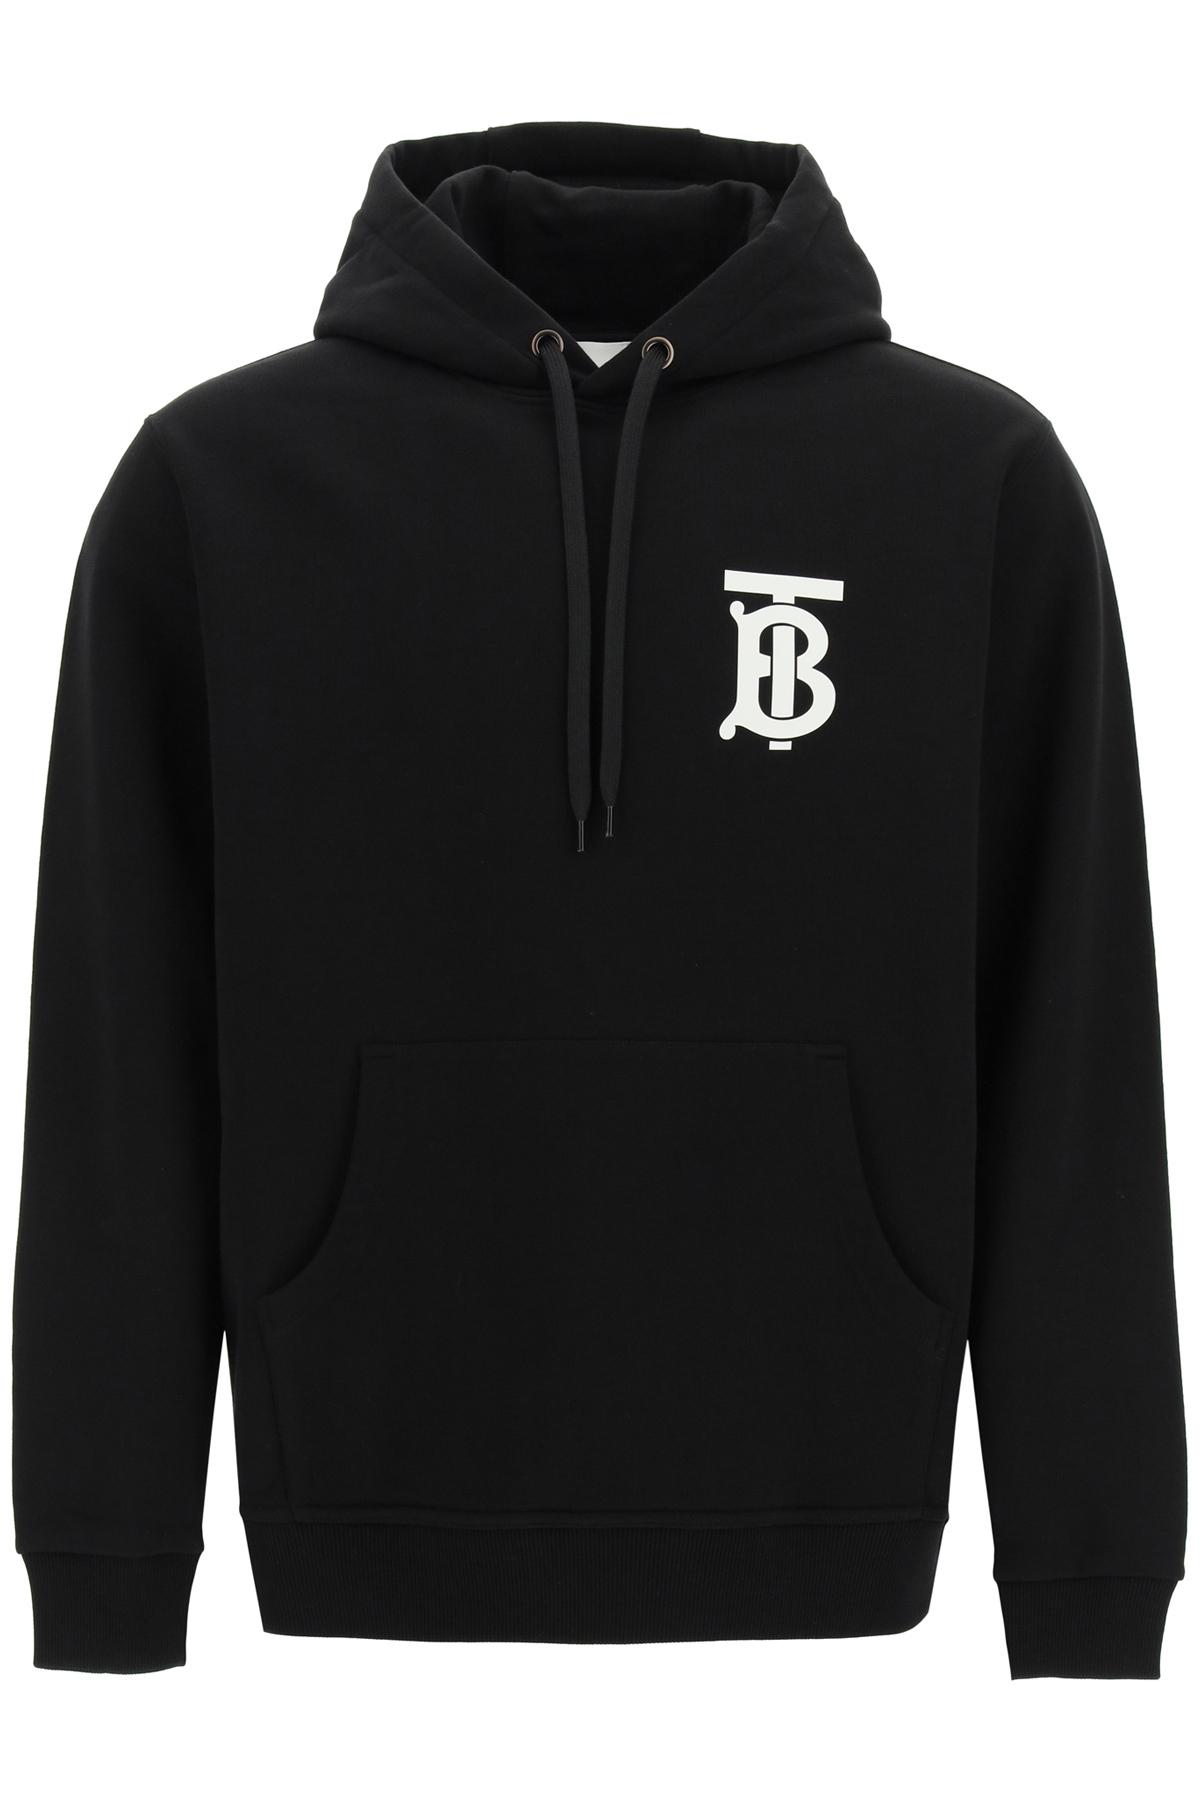 Burberry hoodie with tb monogram